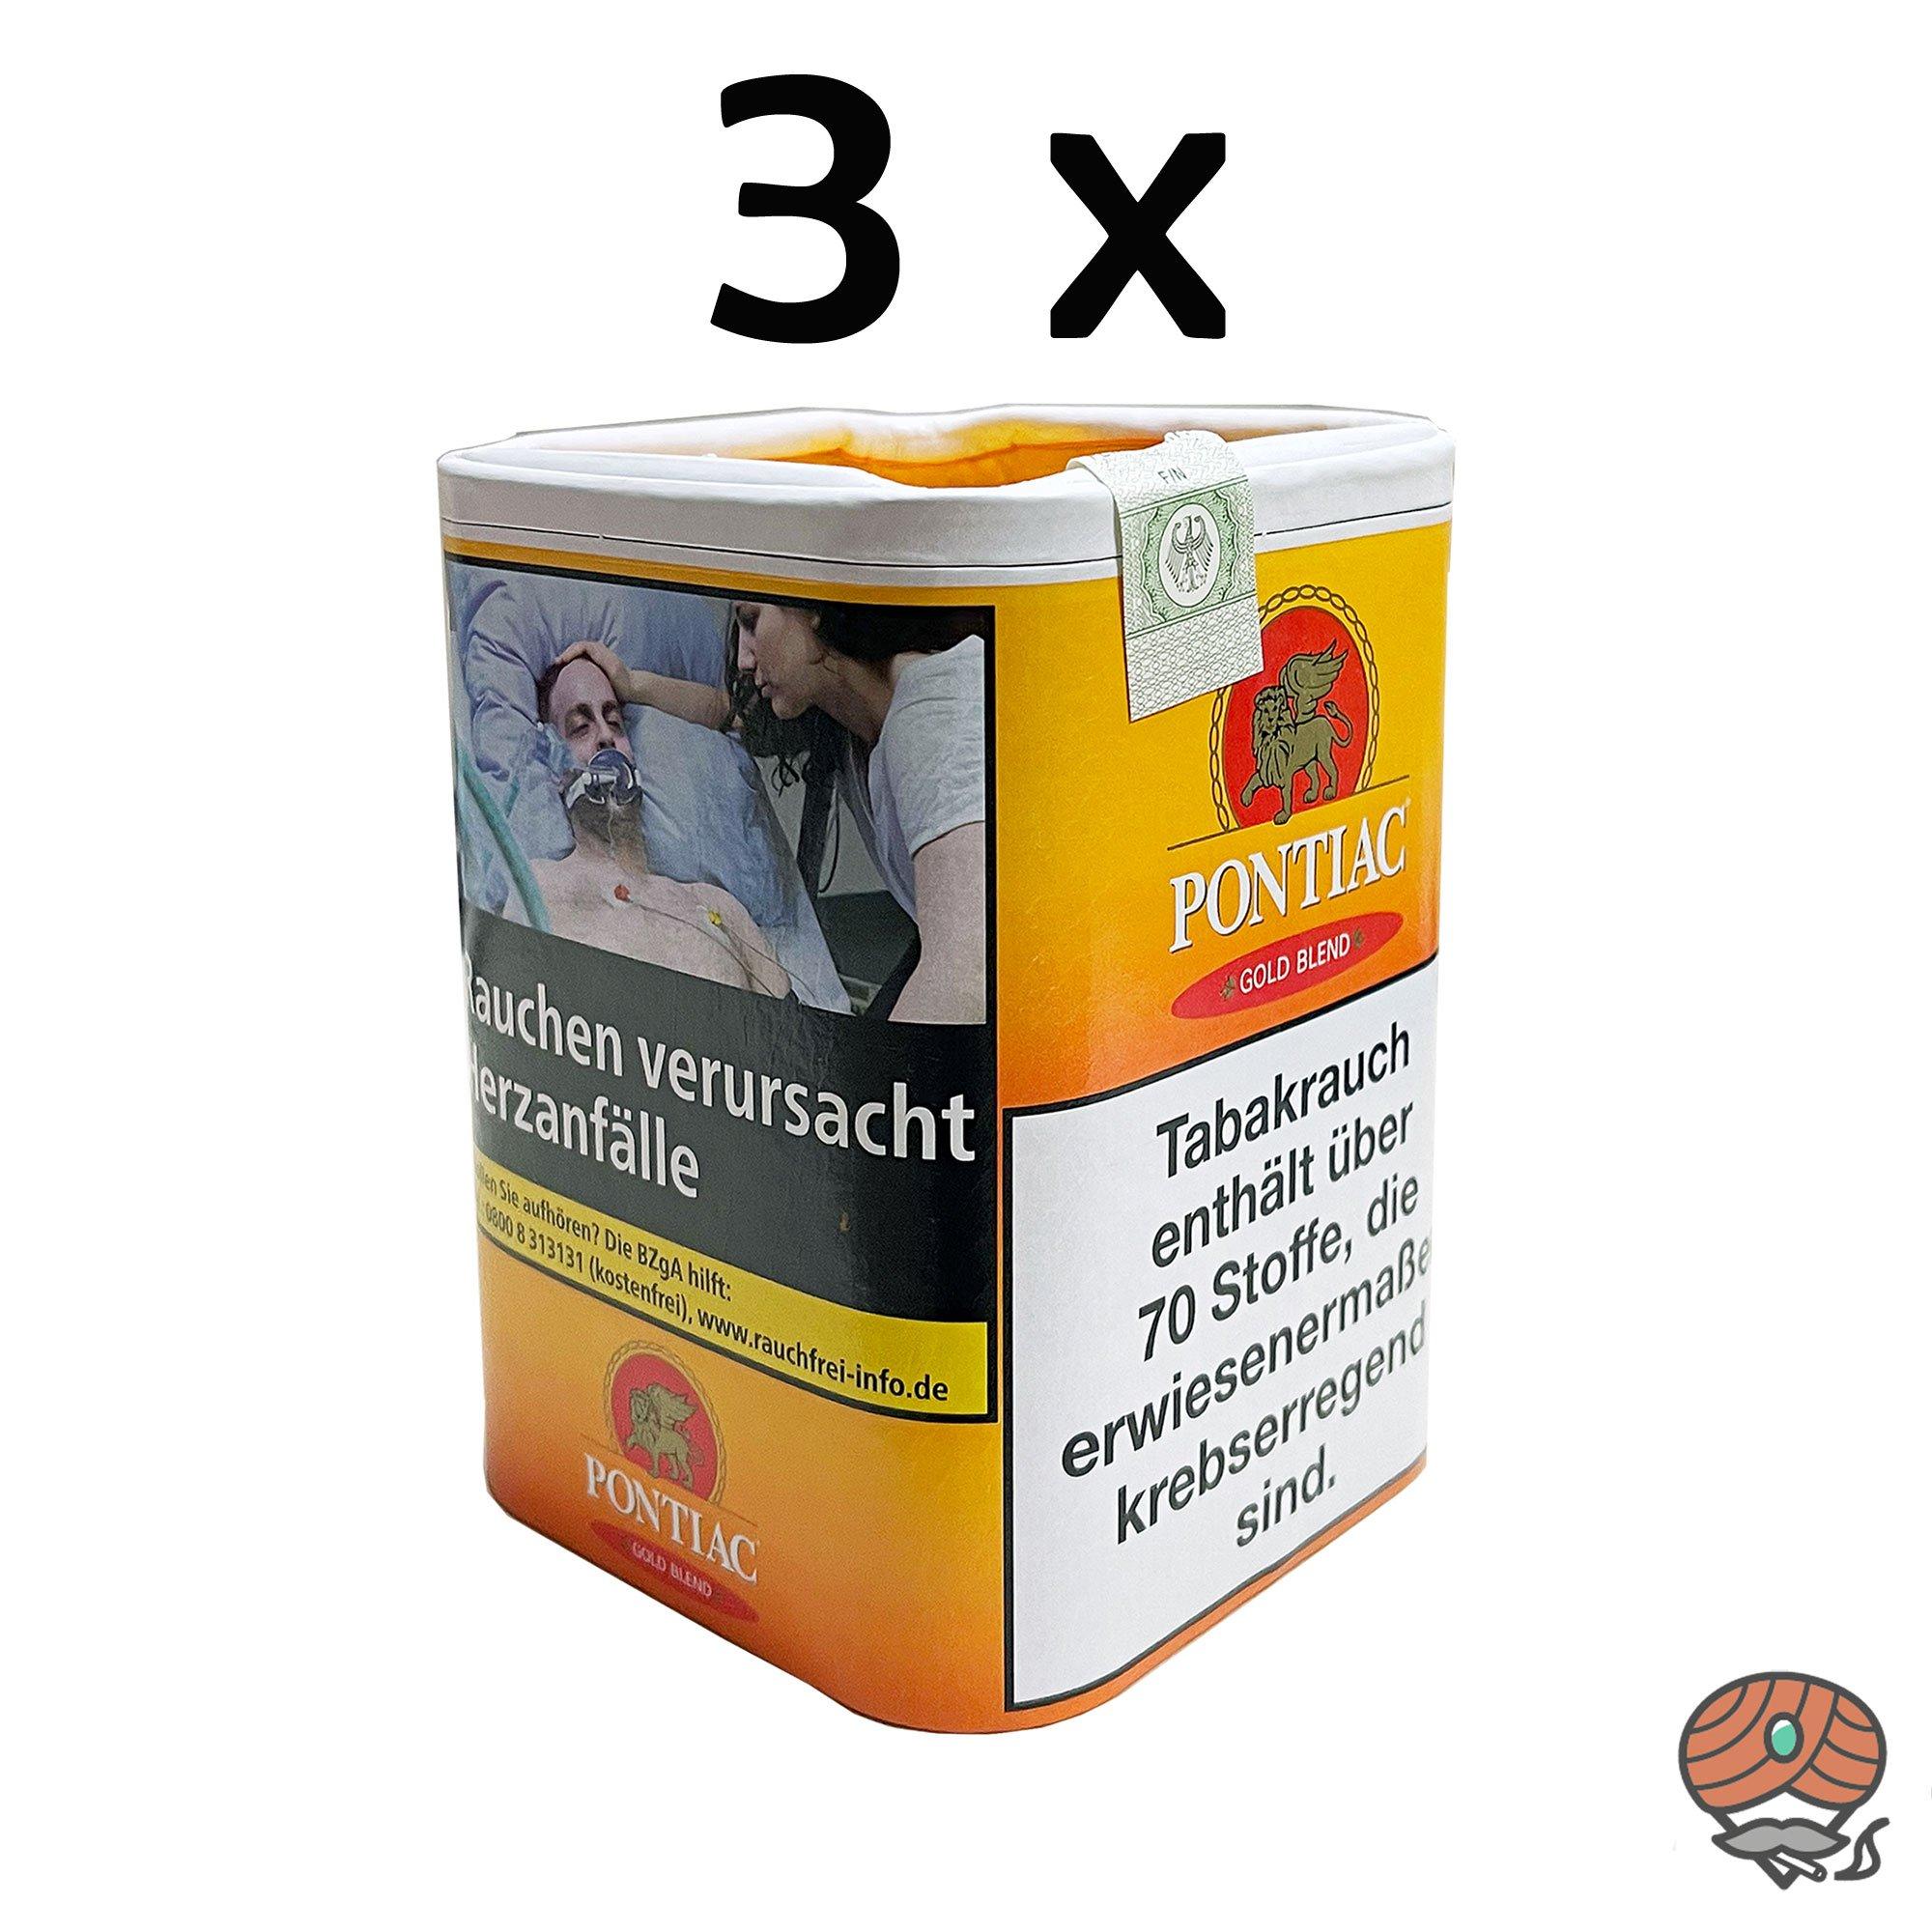 360g = 3 Dosen Pontiac Gold Blend Tabak Dose à 120g